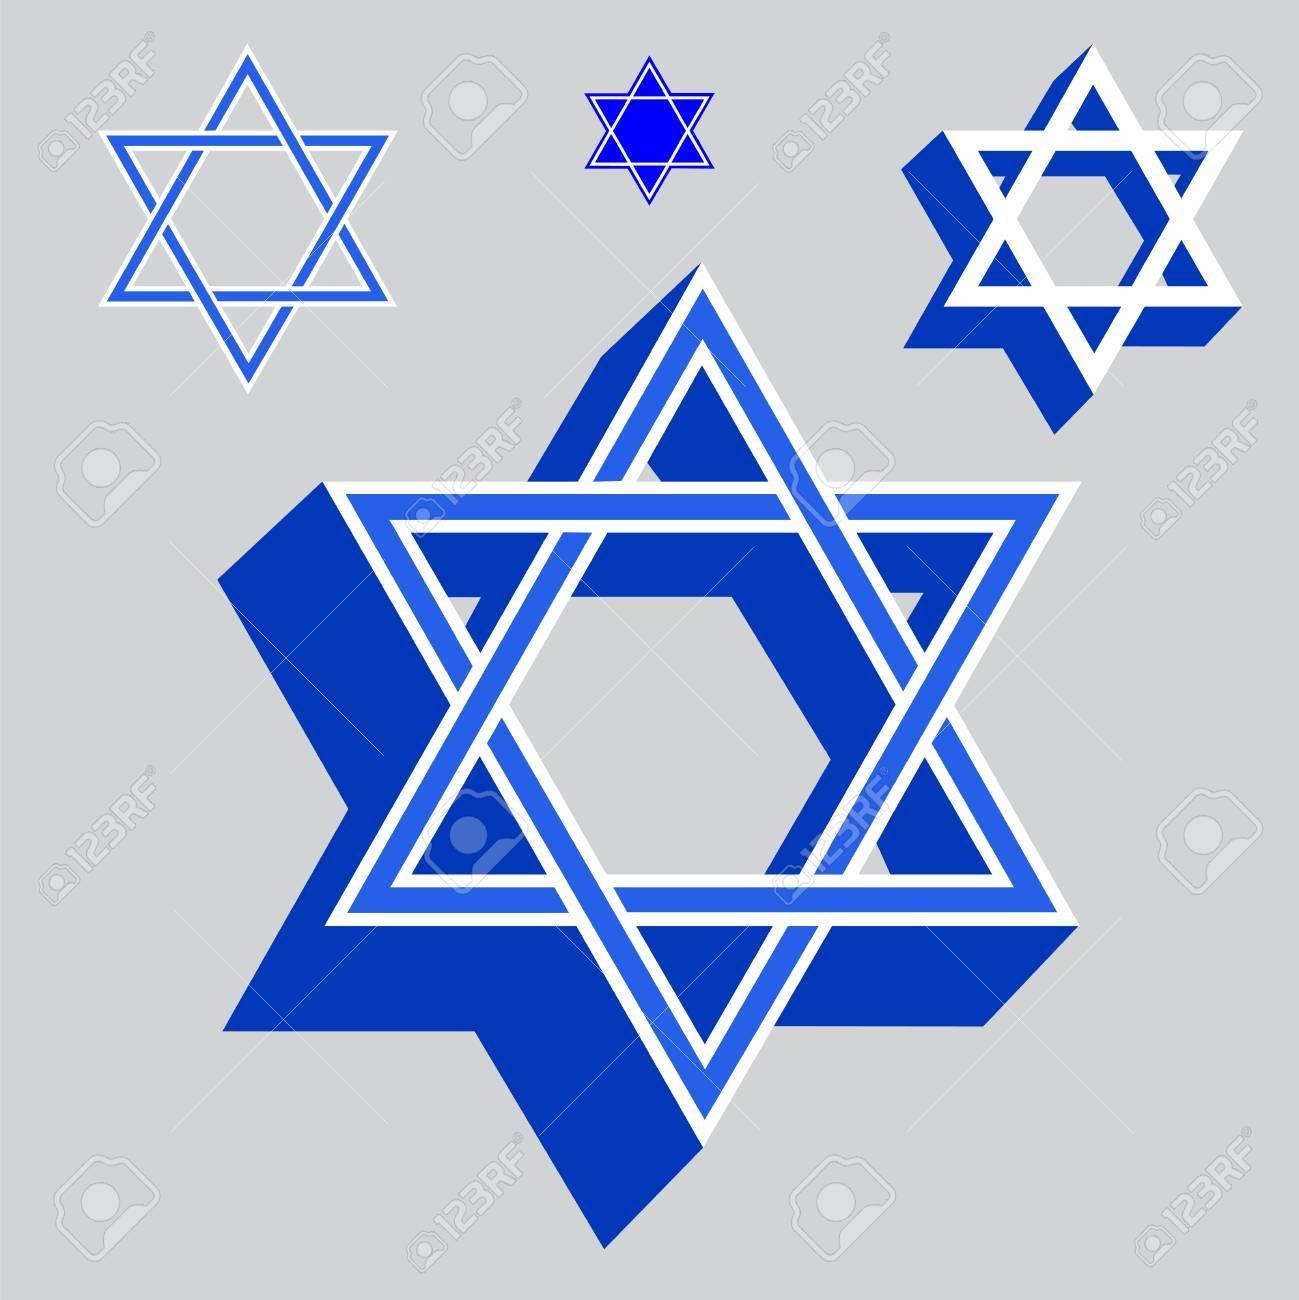 Star Of David Jewish Religious Symbols Vector Illustration